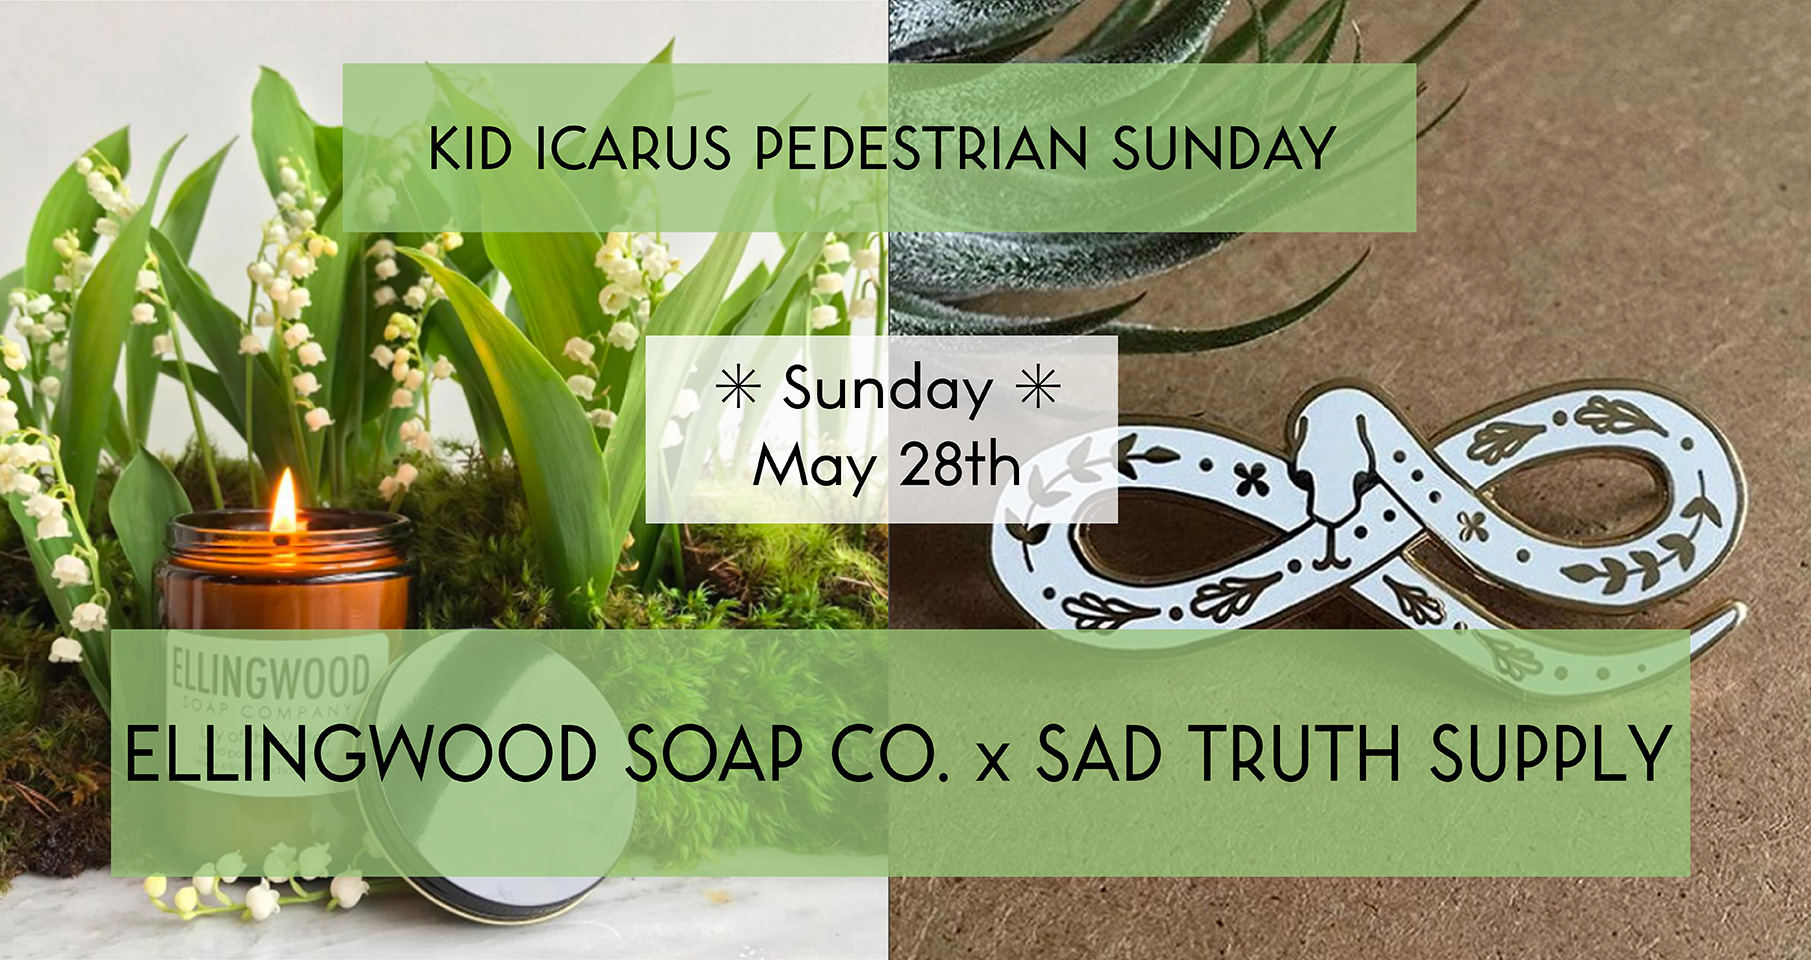 Pedestrian Sunday – May 28, 2016